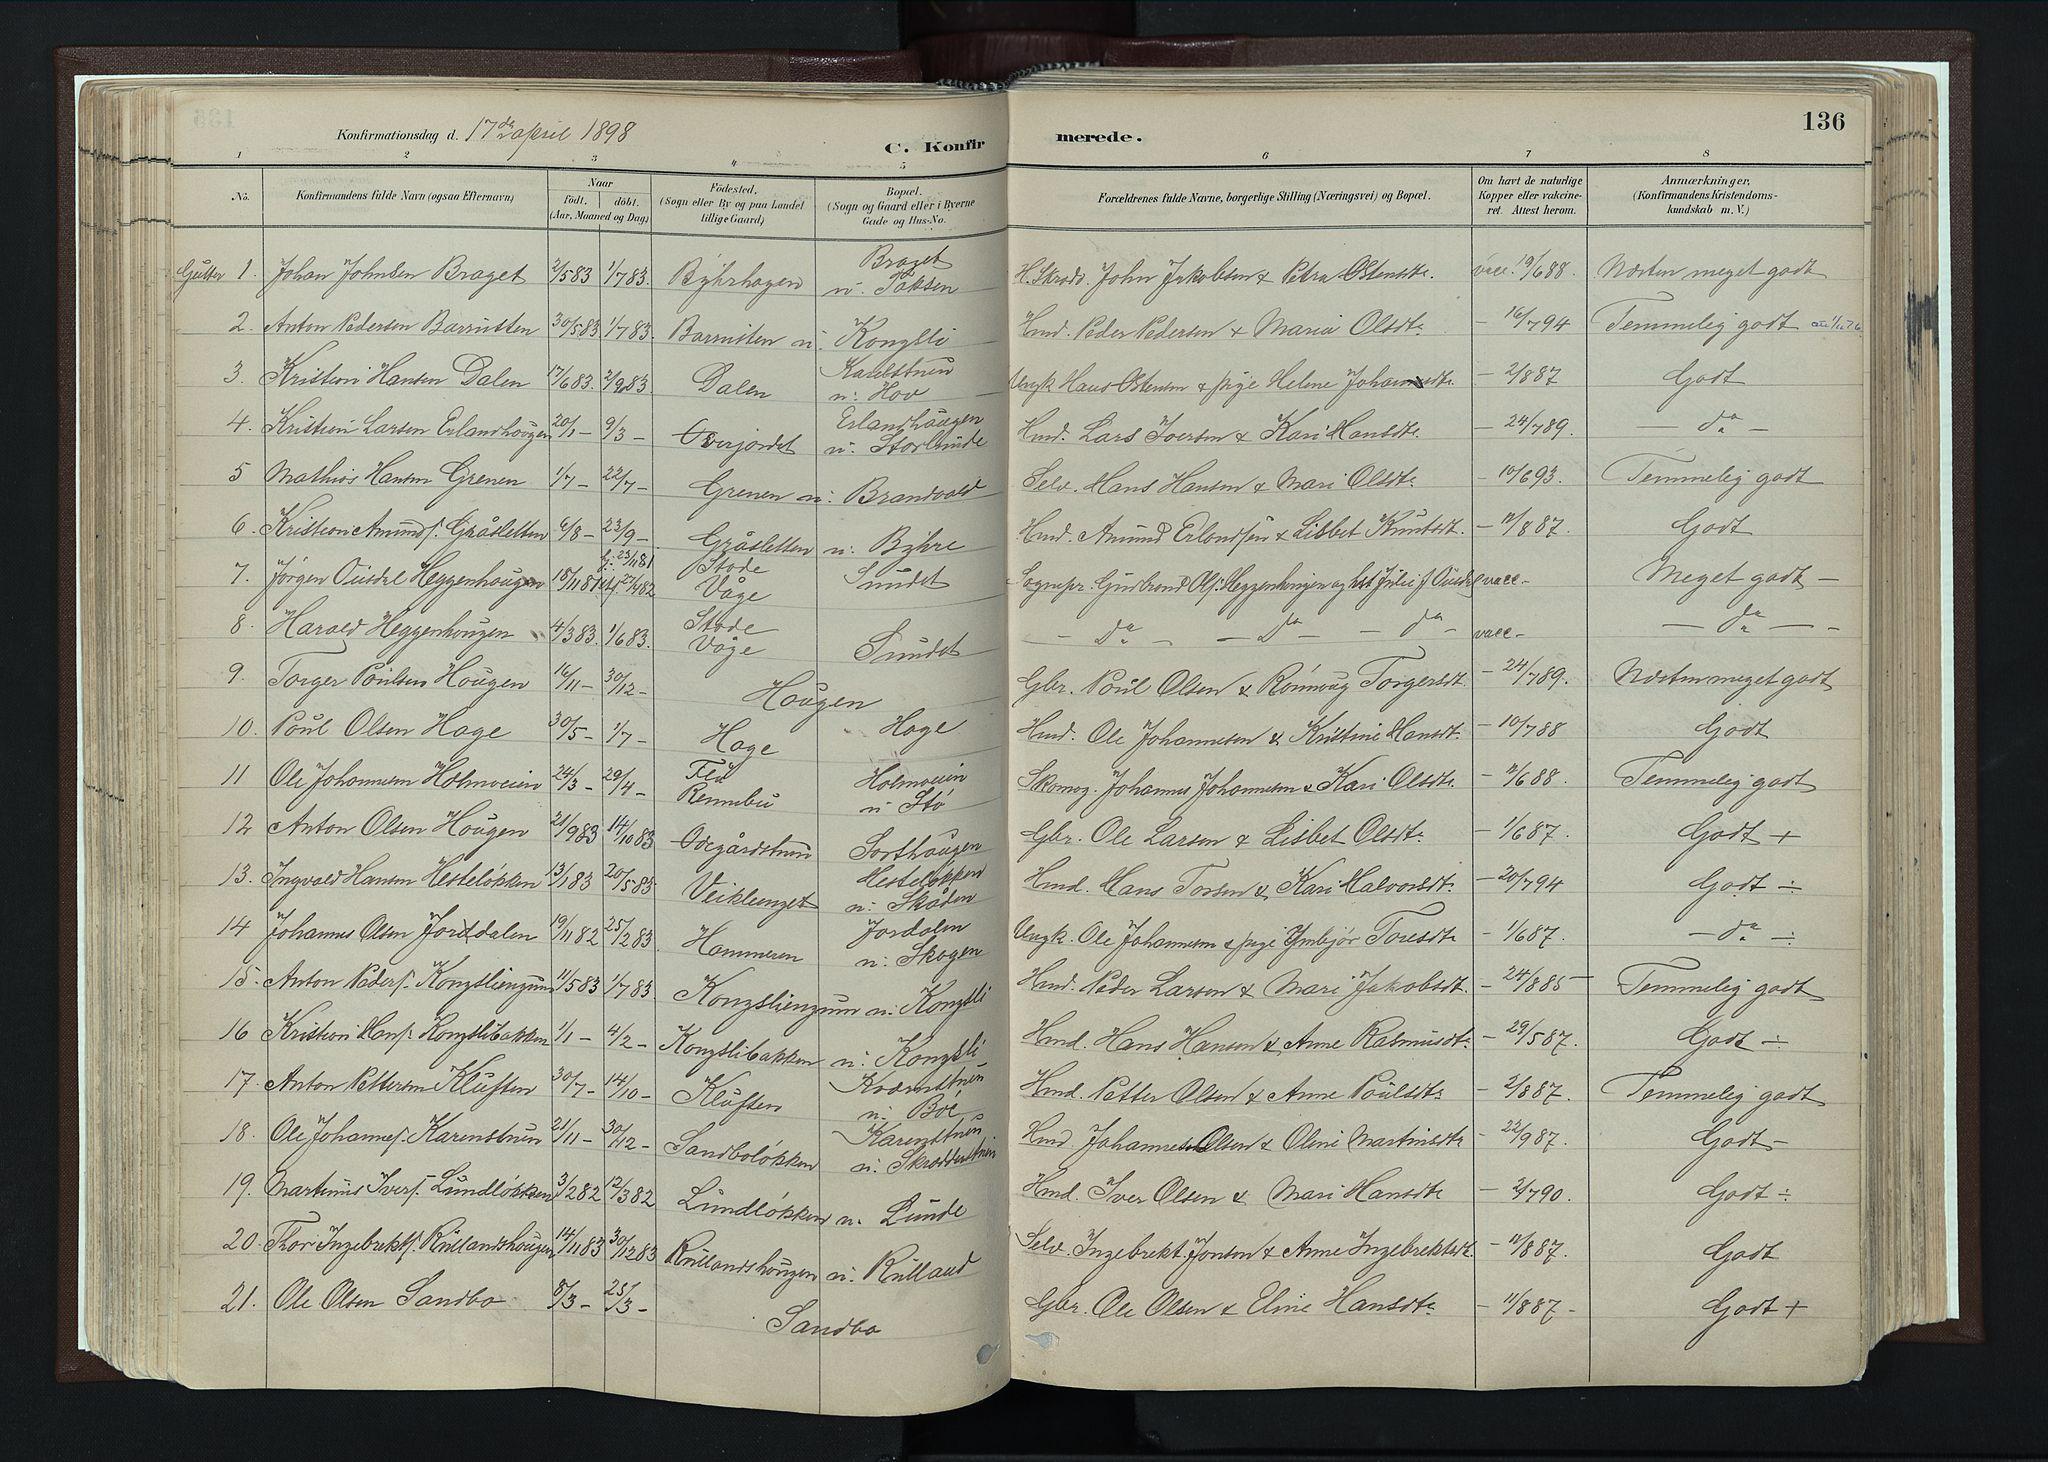 SAH, Nord-Fron prestekontor, Ministerialbok nr. 4, 1884-1914, s. 136